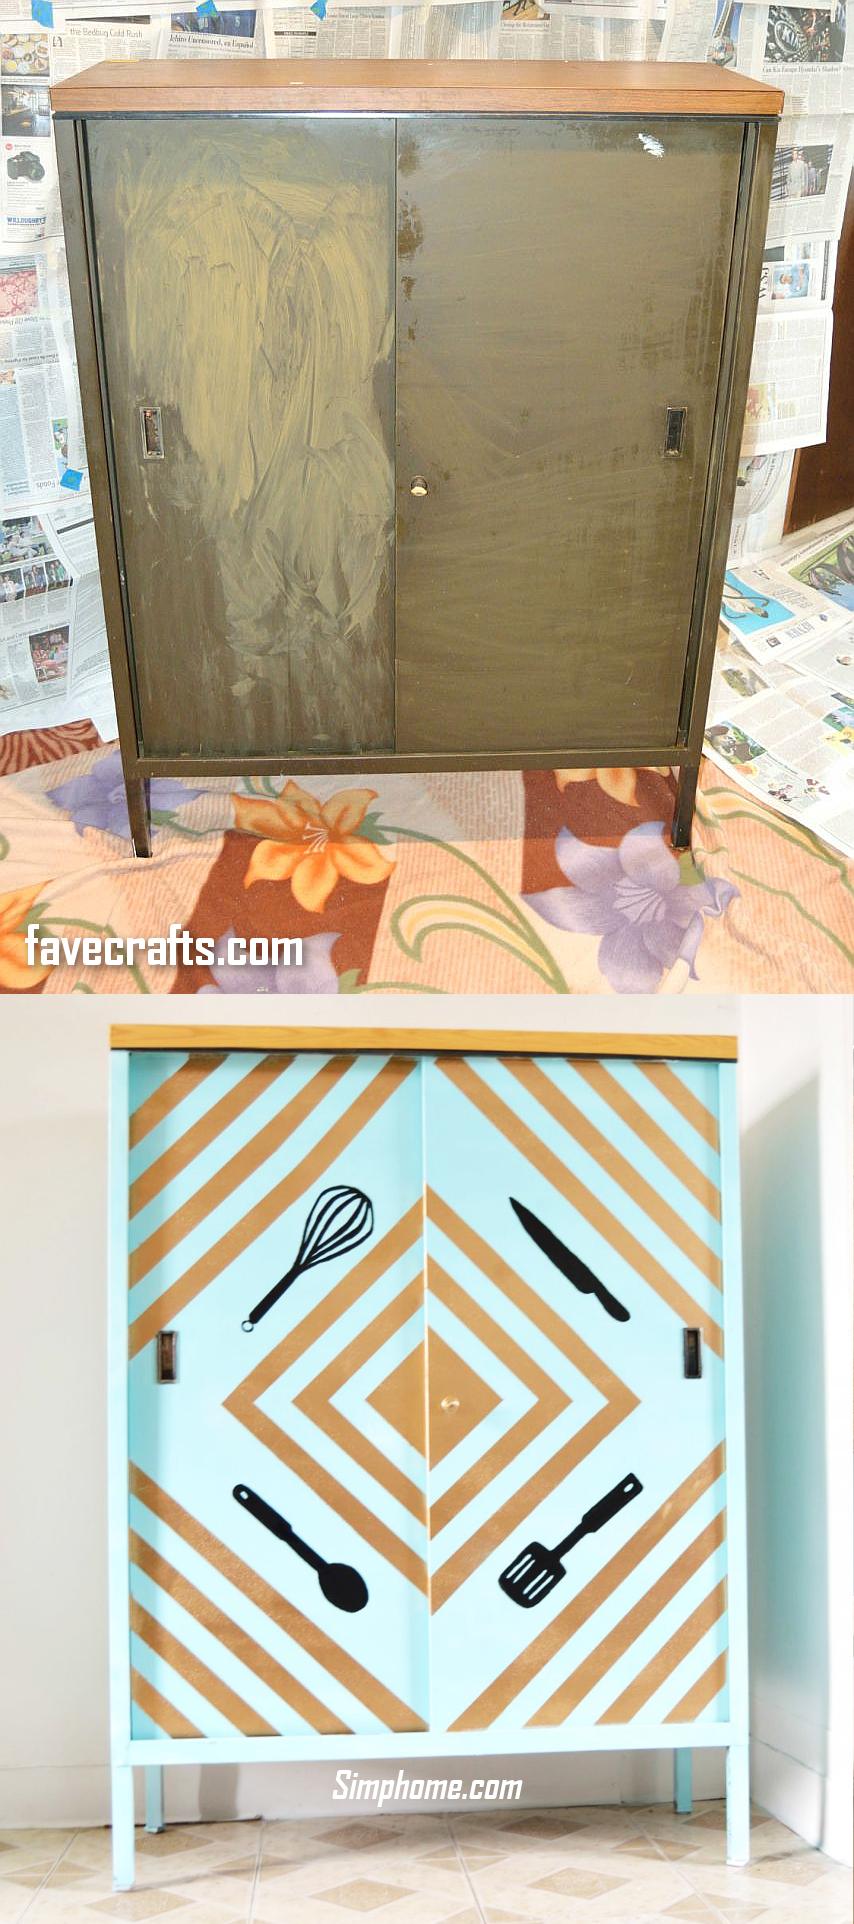 5. Crafty Kitchen Cabinet Makeover via Simphome.com